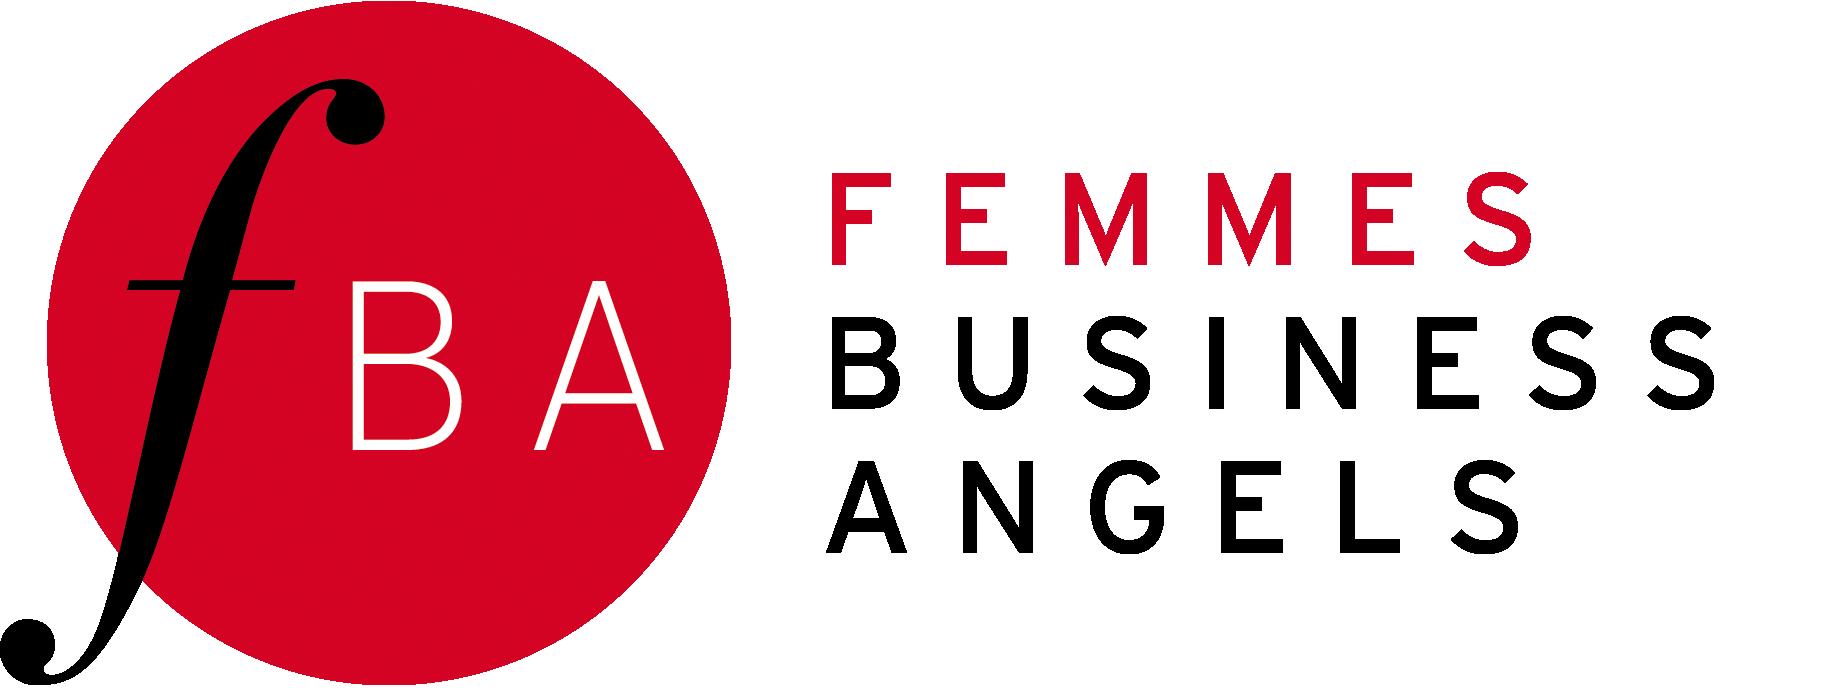 Femmes Business Angels FBA